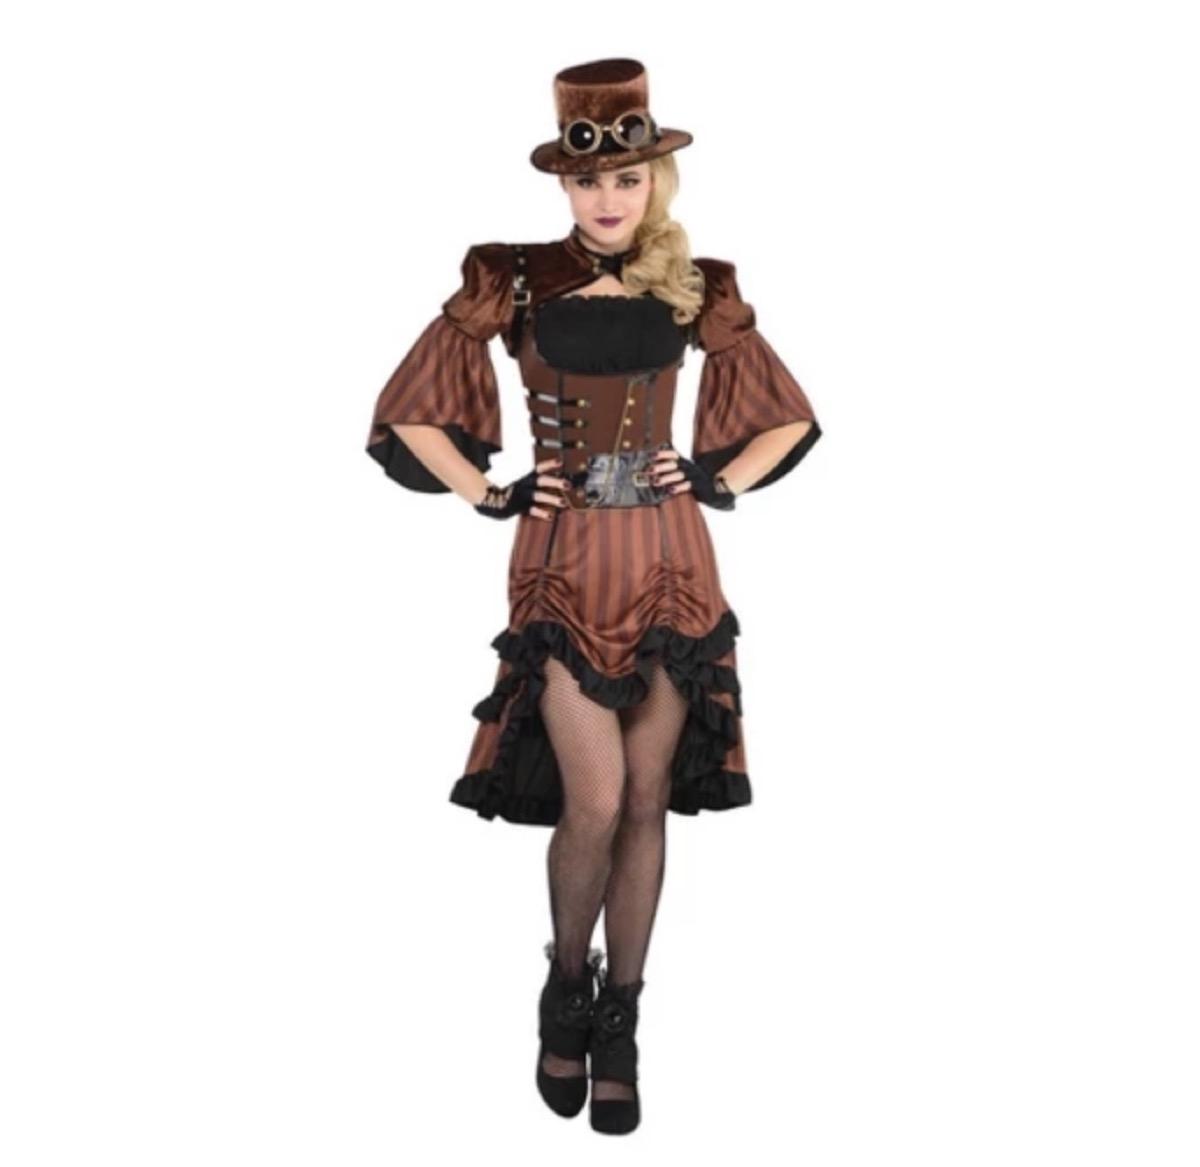 steampunk costume, target halloween costumes